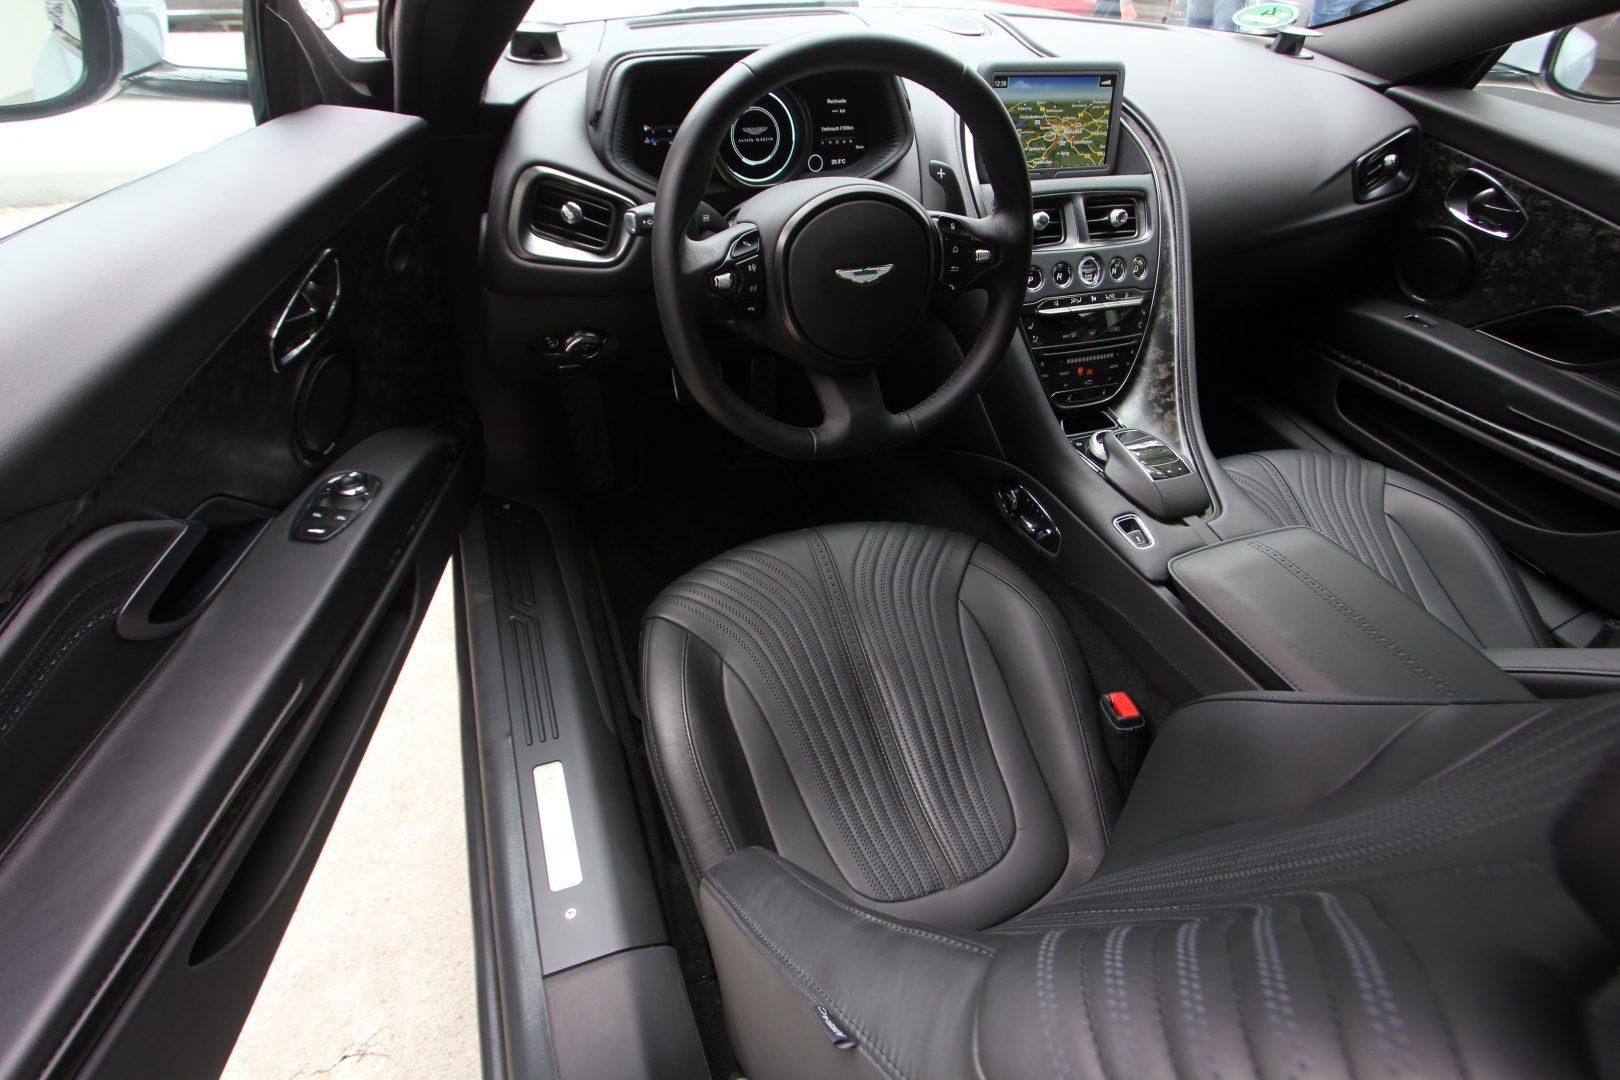 AIL Aston Martin DB11 Coupe 5.2 V12 10